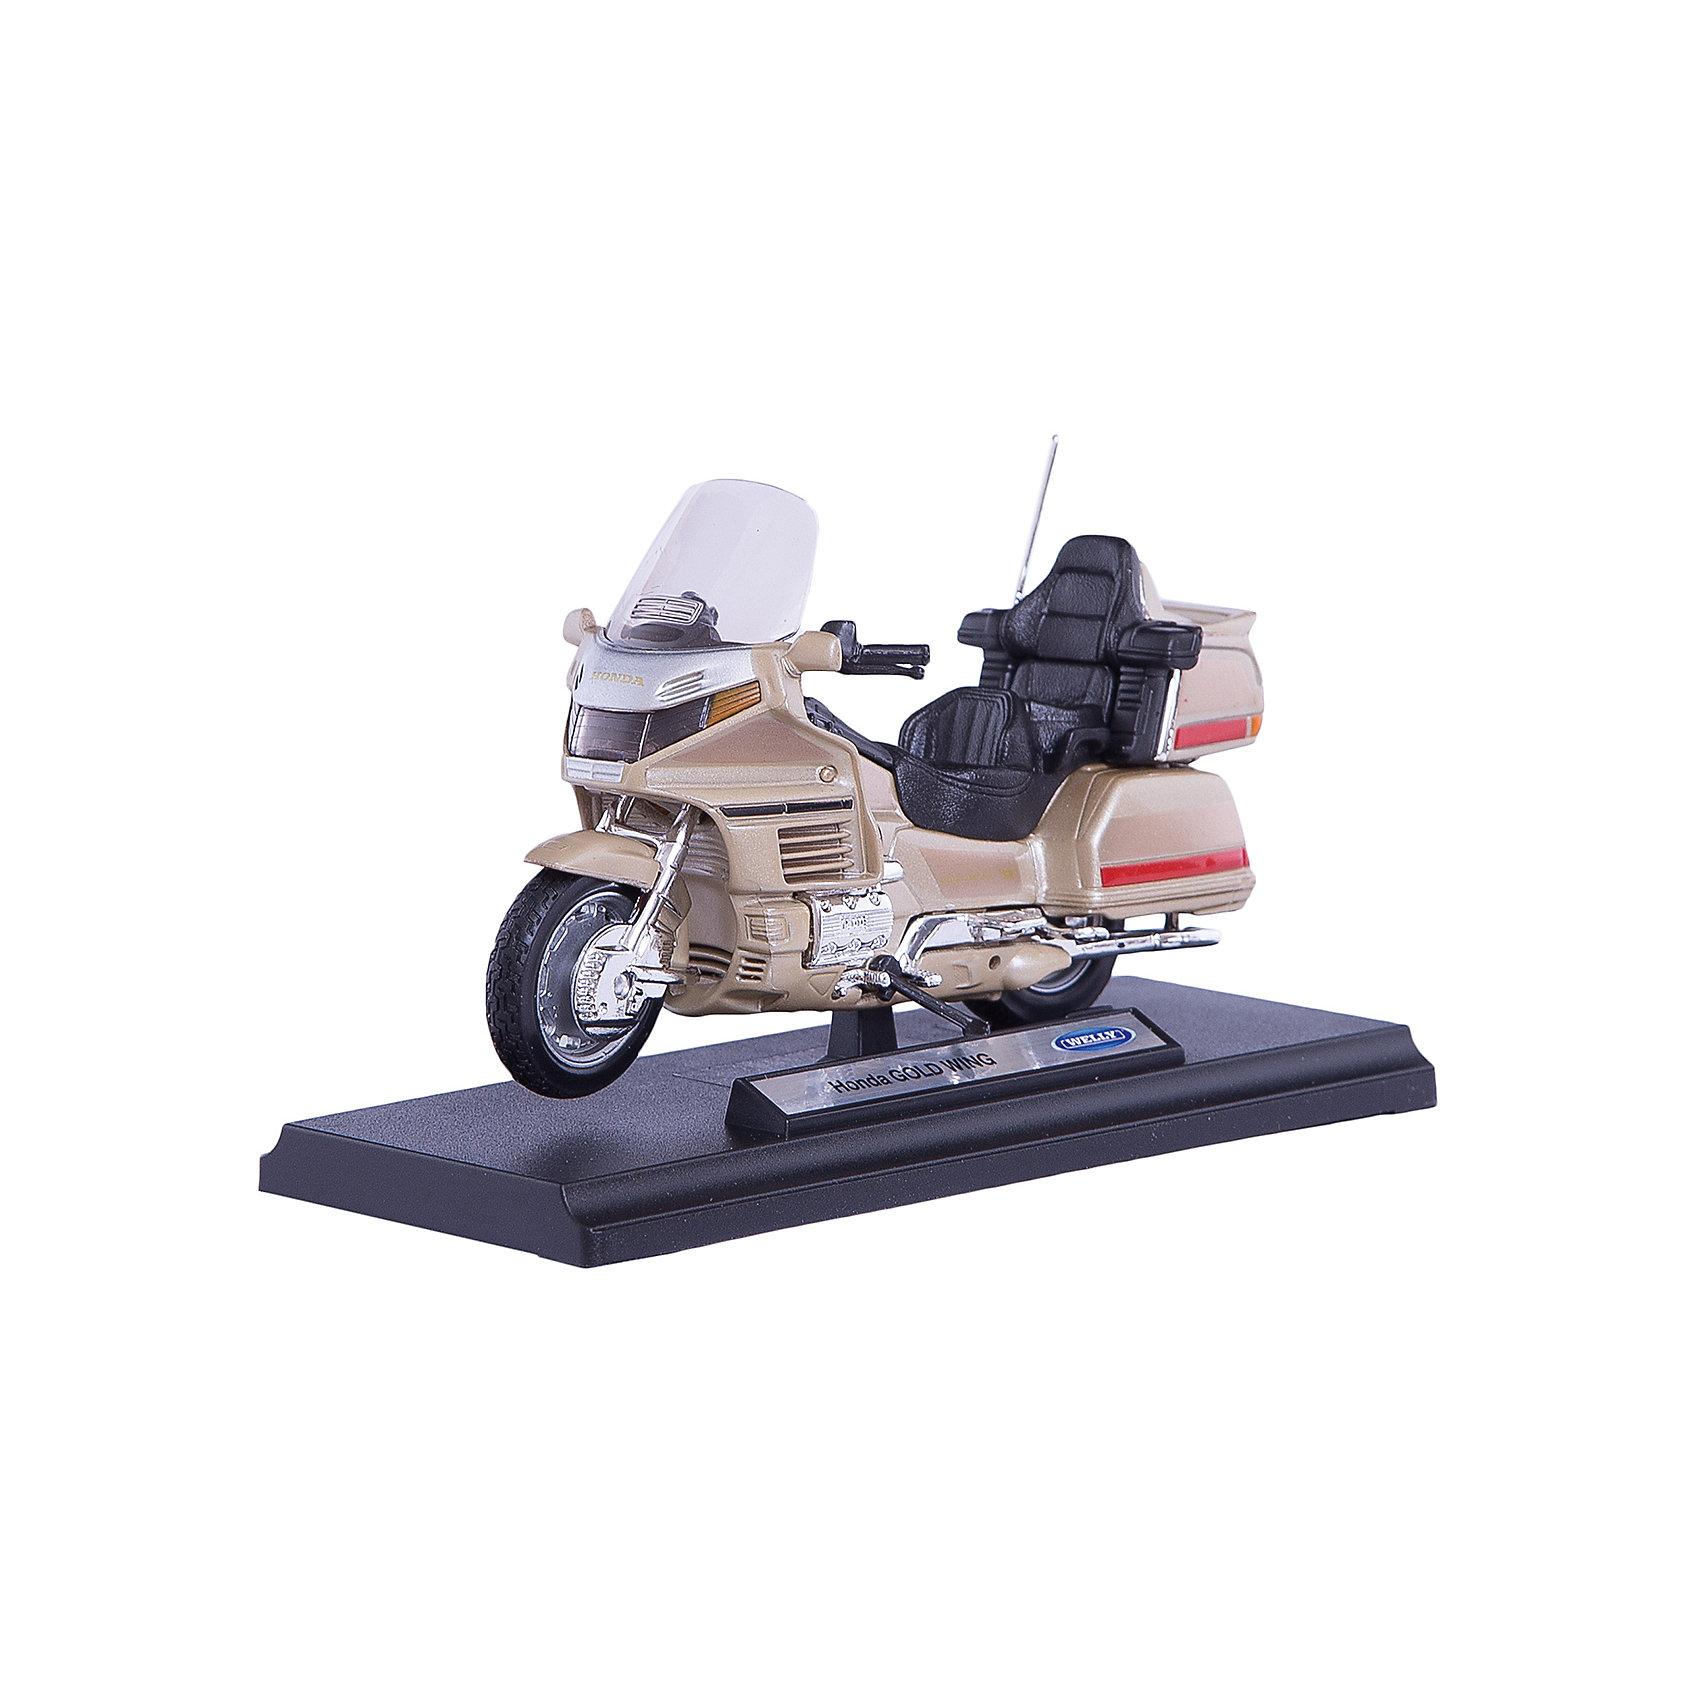 Модель мотоцикла 1:18 Honda Gold Wing, WellyКоллекционные модели<br>Модель мотоцикла Welly 1:18 HONDA Gold Wing<br><br>Ширина мм: 70<br>Глубина мм: 110<br>Высота мм: 170<br>Вес г: 205<br>Возраст от месяцев: 36<br>Возраст до месяцев: 192<br>Пол: Мужской<br>Возраст: Детский<br>SKU: 4966471